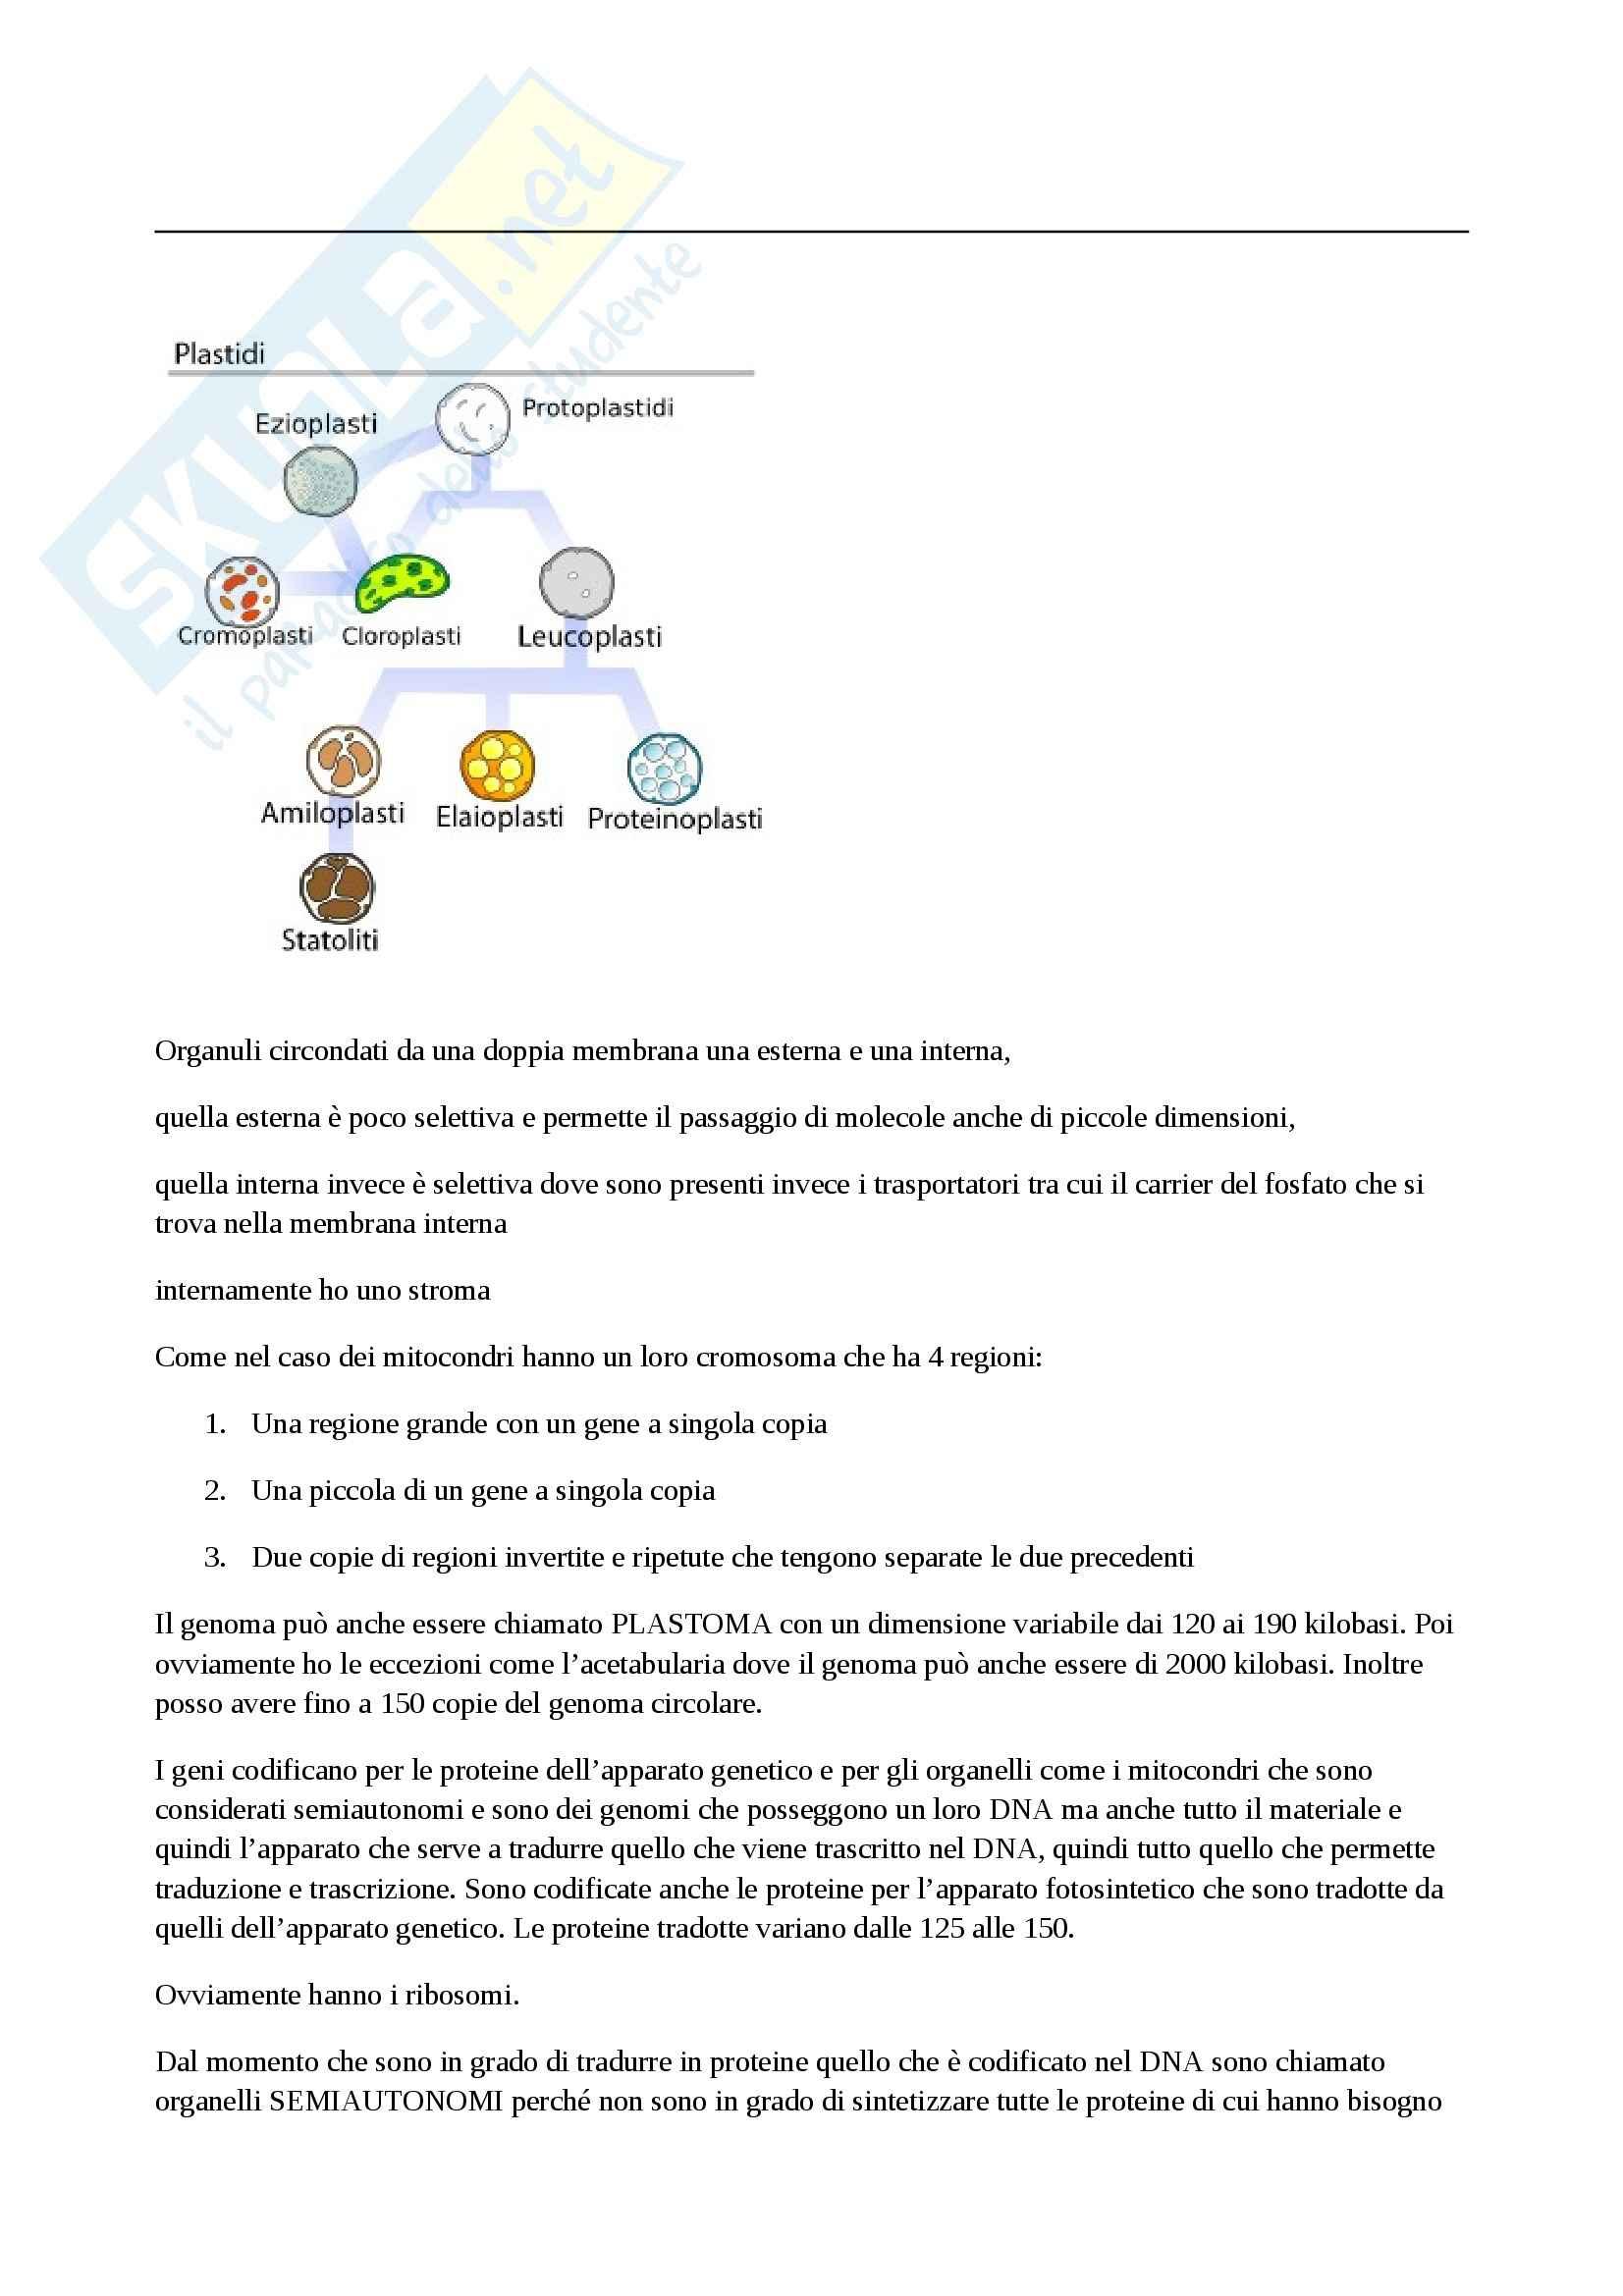 Biochimica vegetale - i plastidi